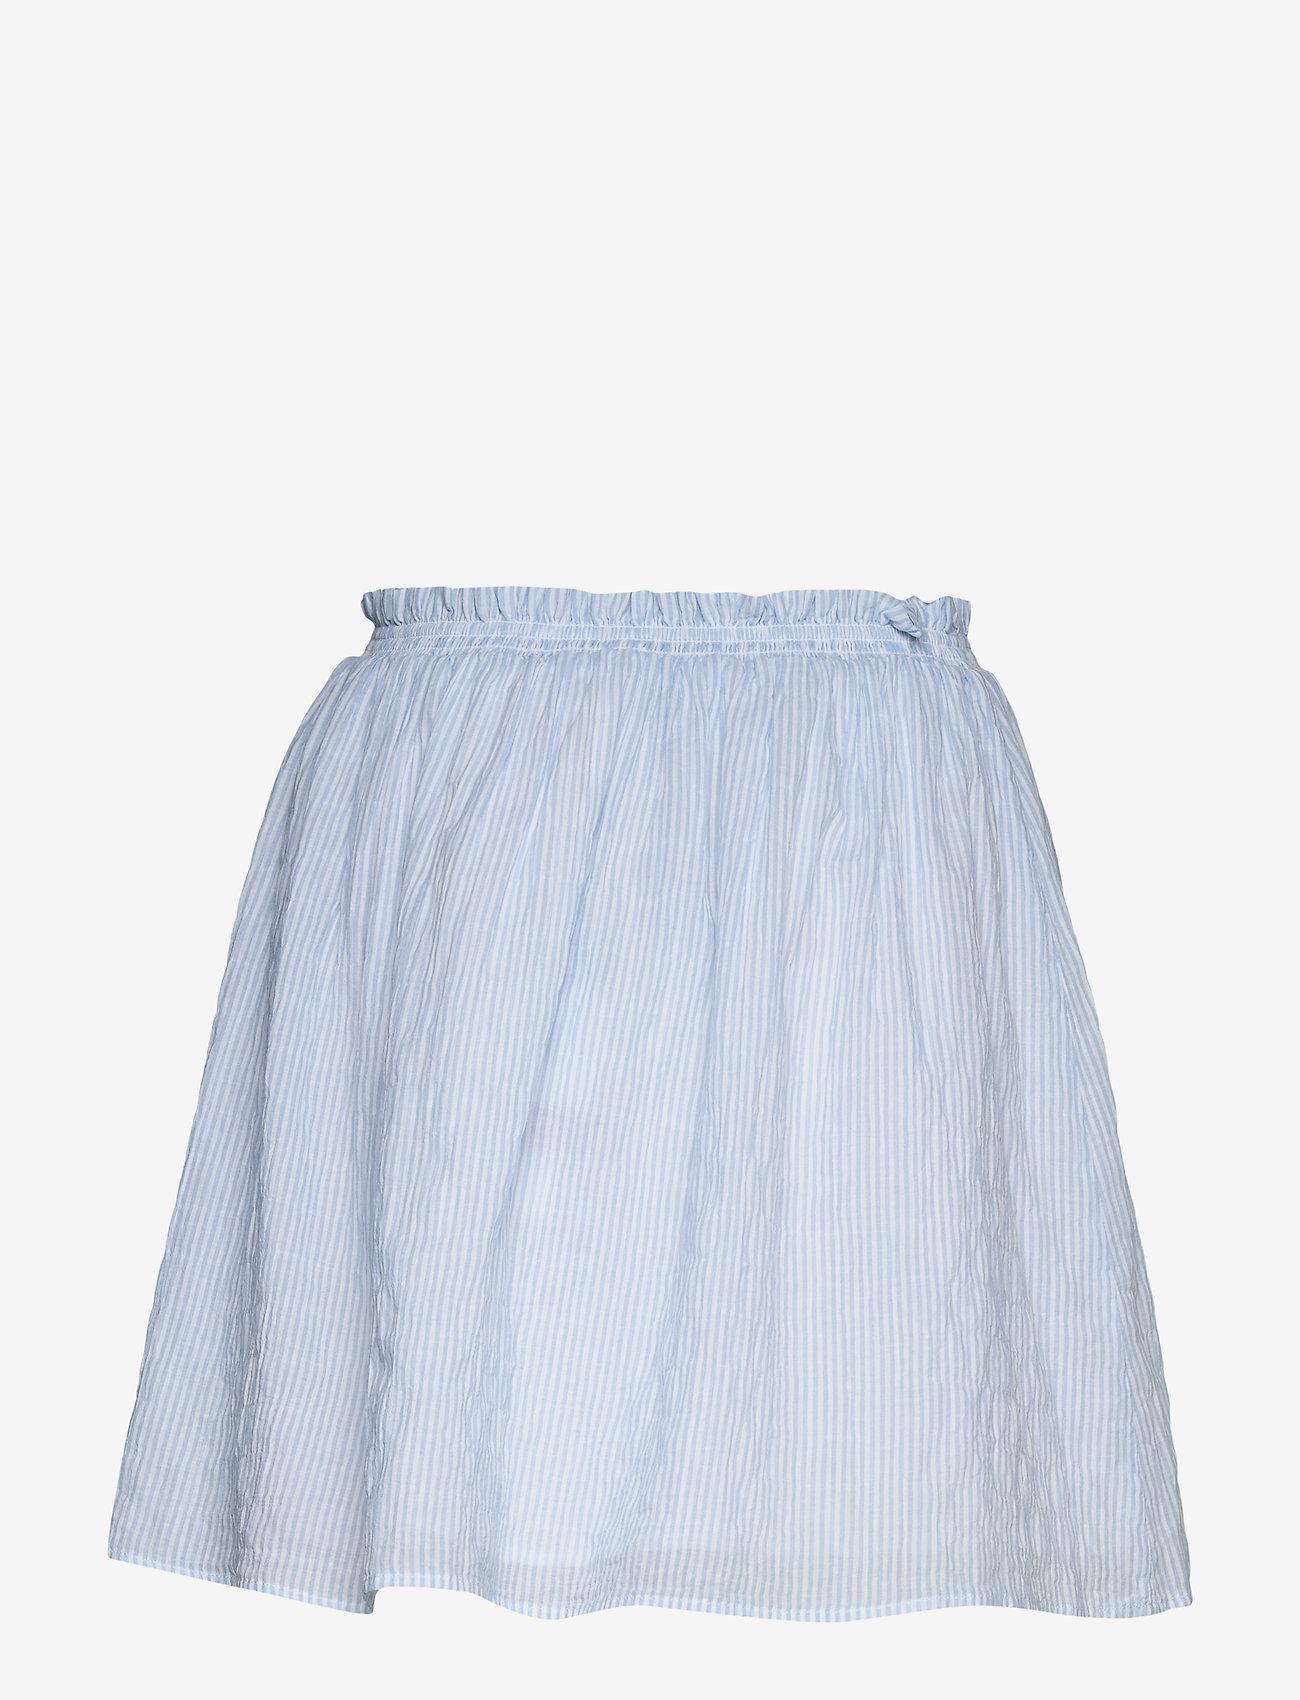 Tommy Jeans - TJW SUMMER SEERSUCKER SKIRT - jupes courtes - white / moderate blue - 1